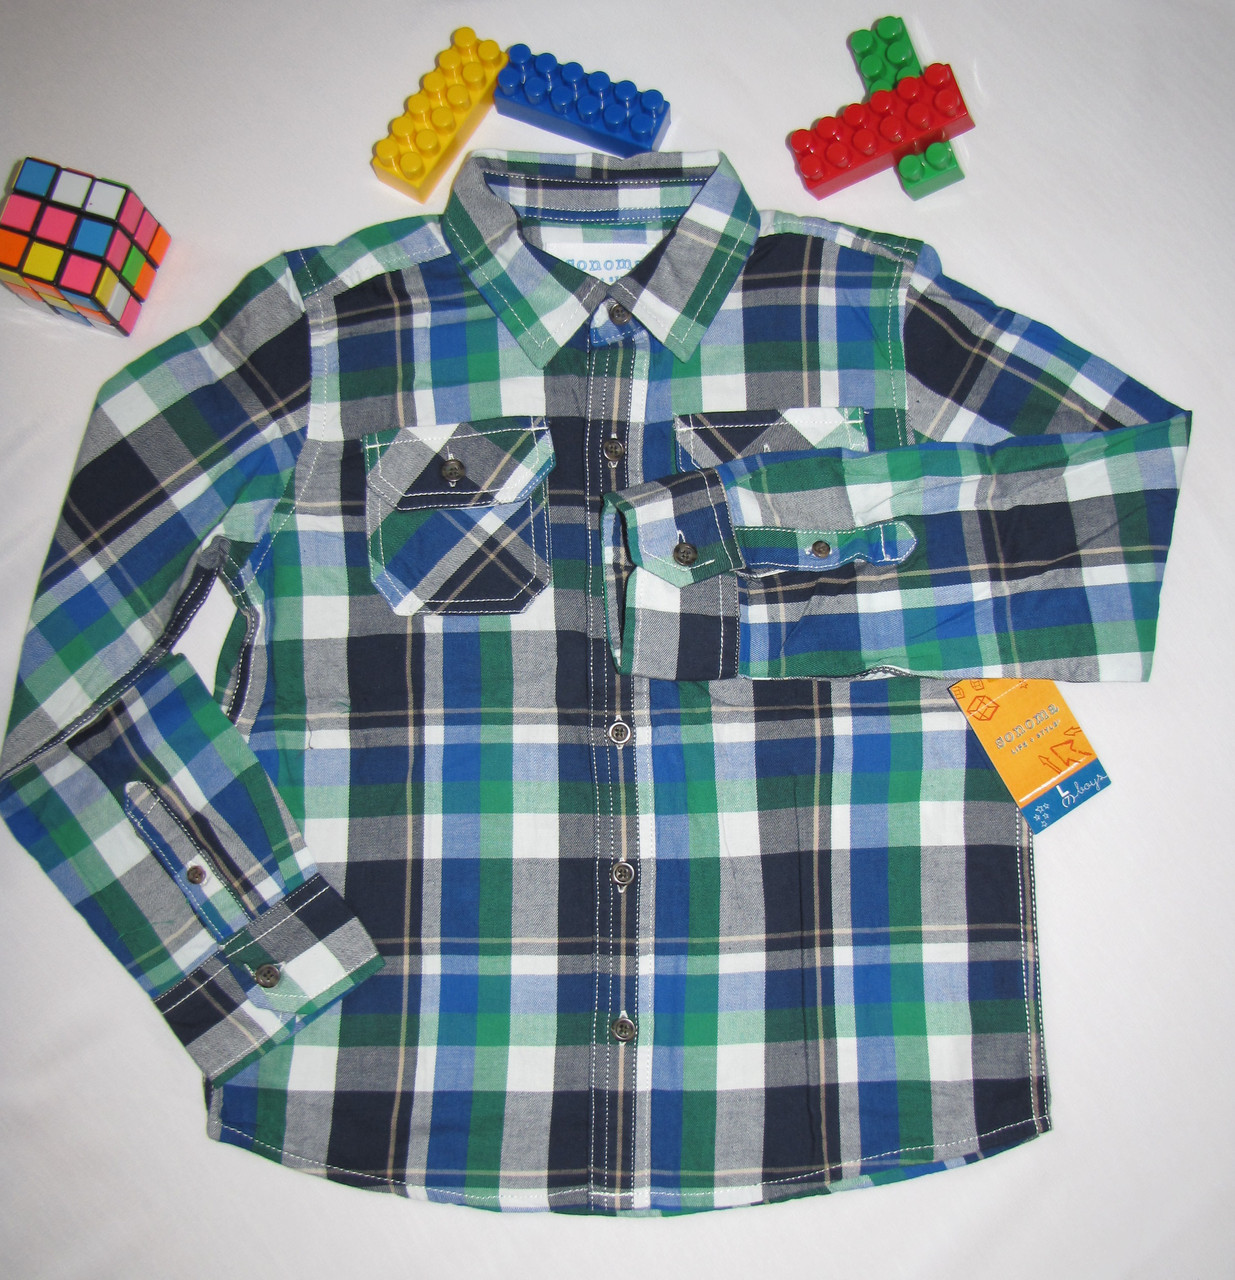 Рубашка Sonoma оригинал  рост 122 см синяя+зеленая 07055